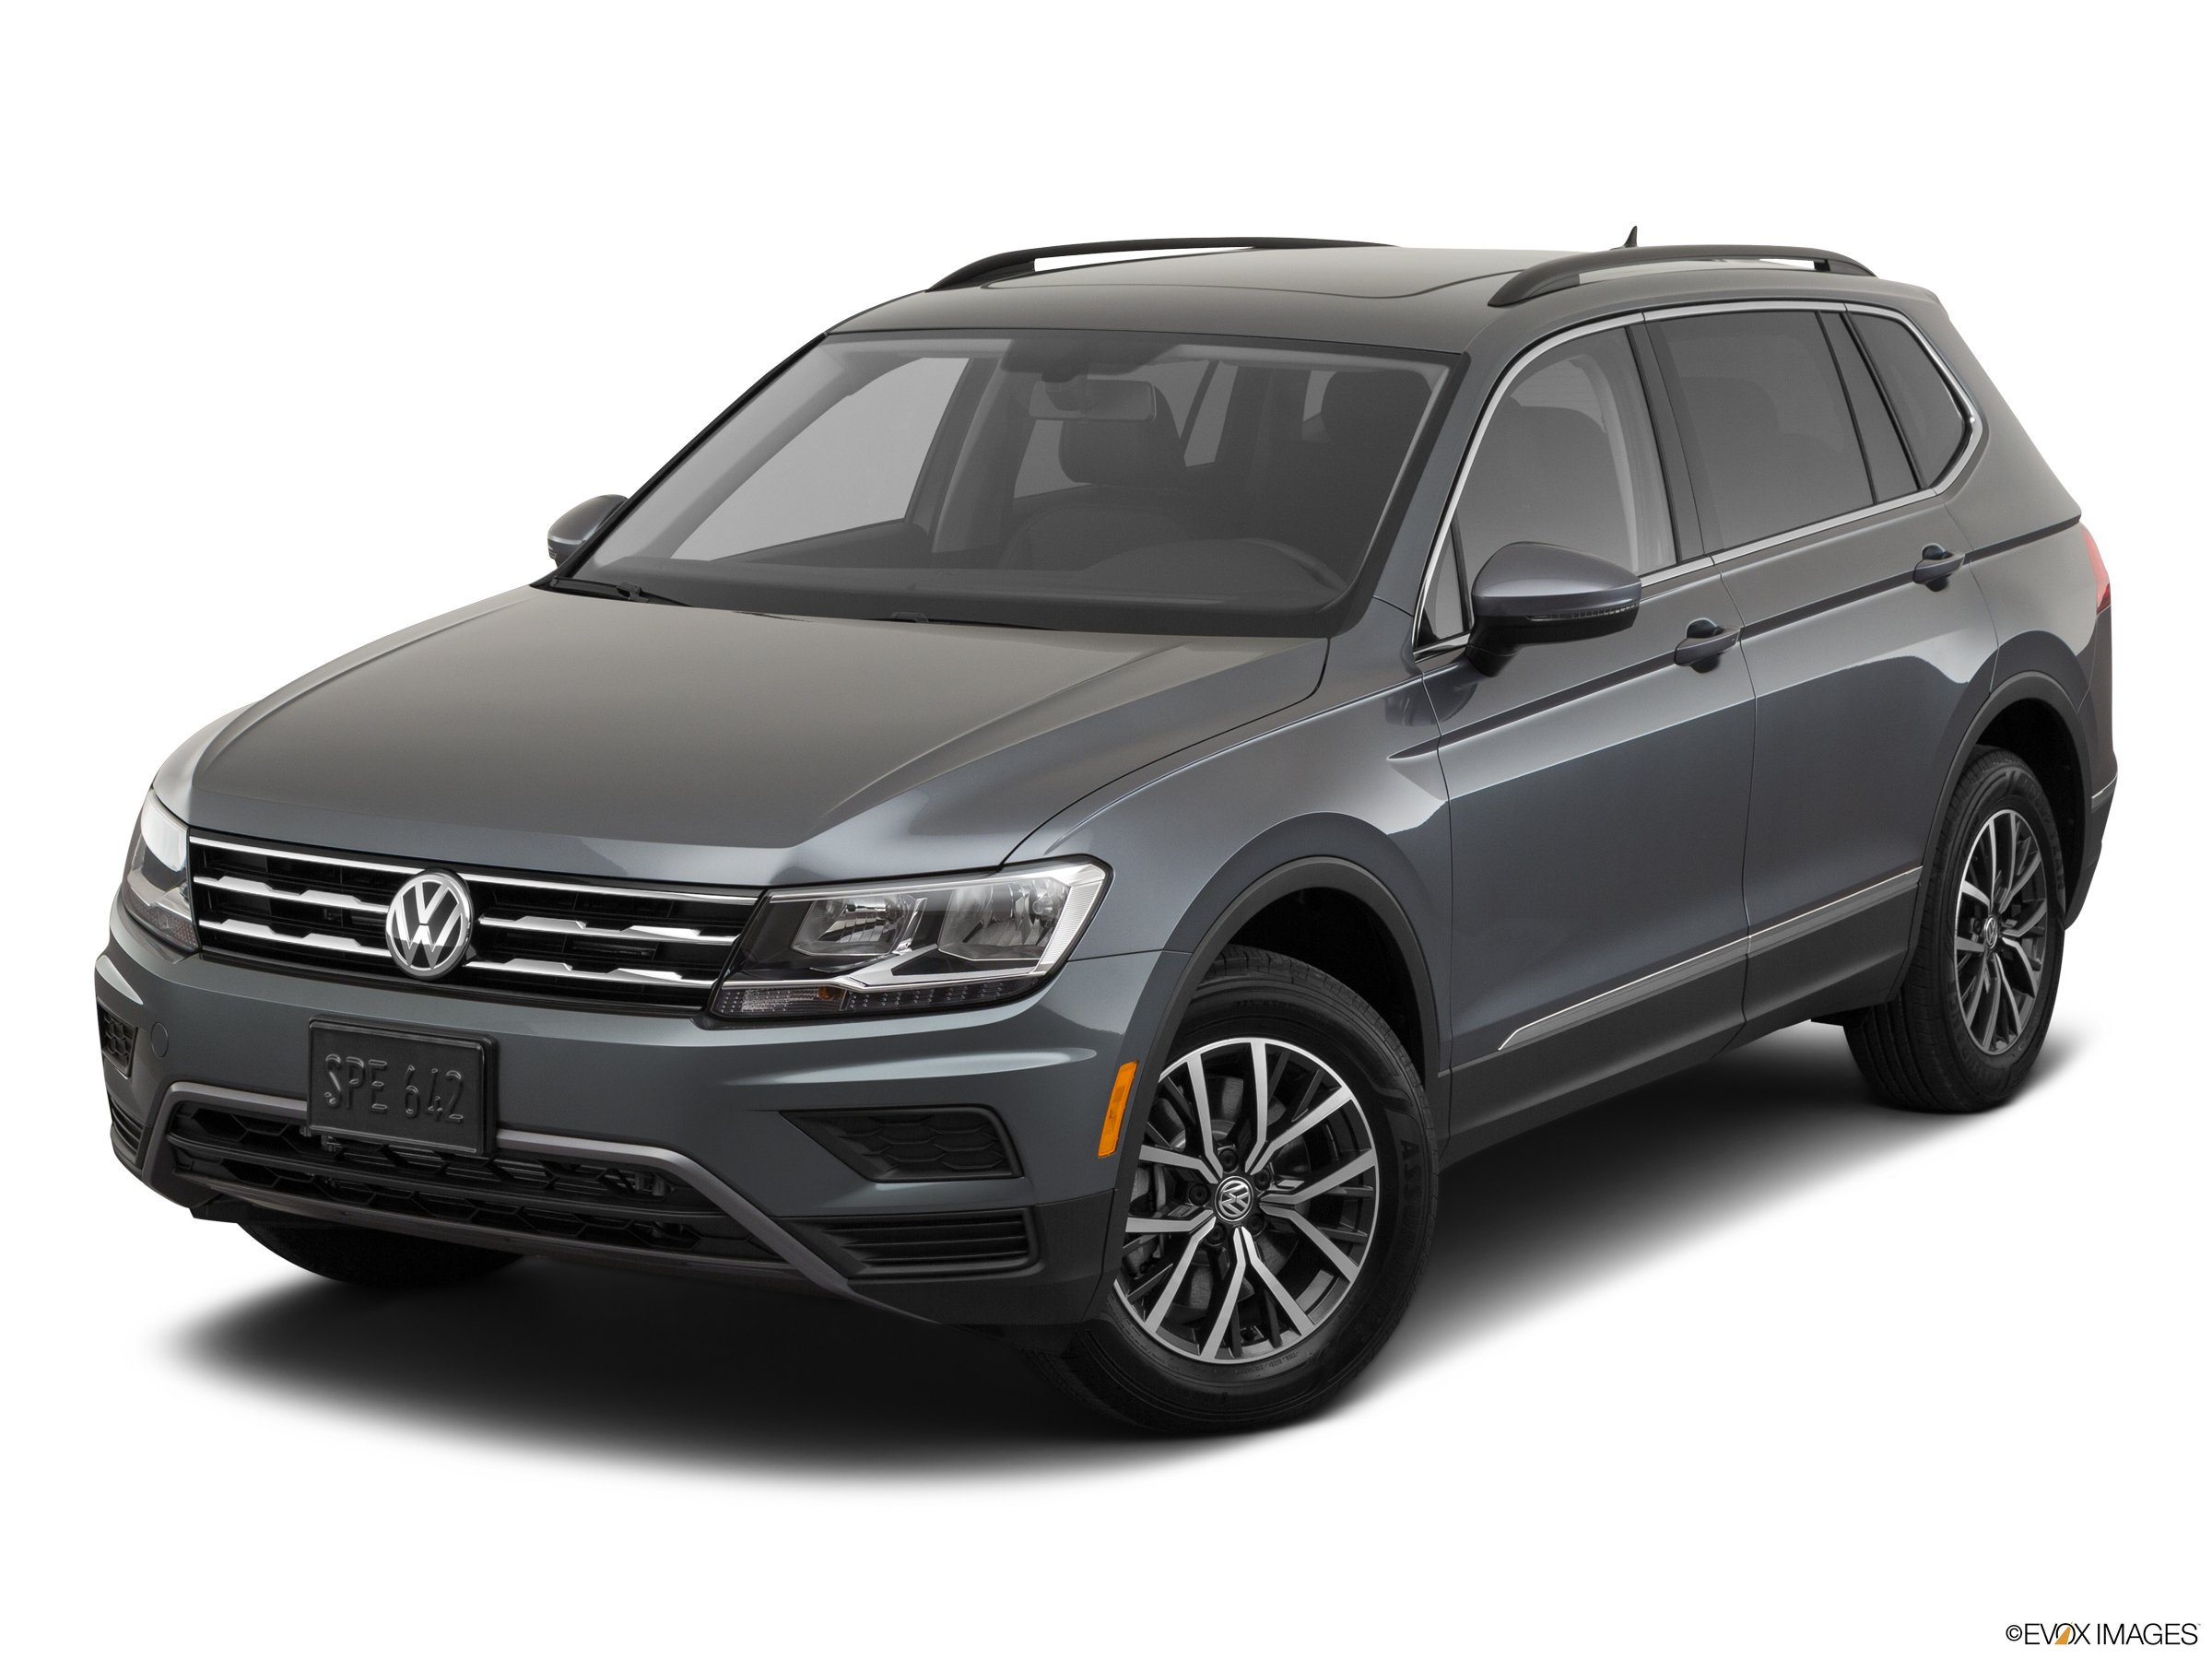 2020 Volkswagen Tiguan SE FWD CUV